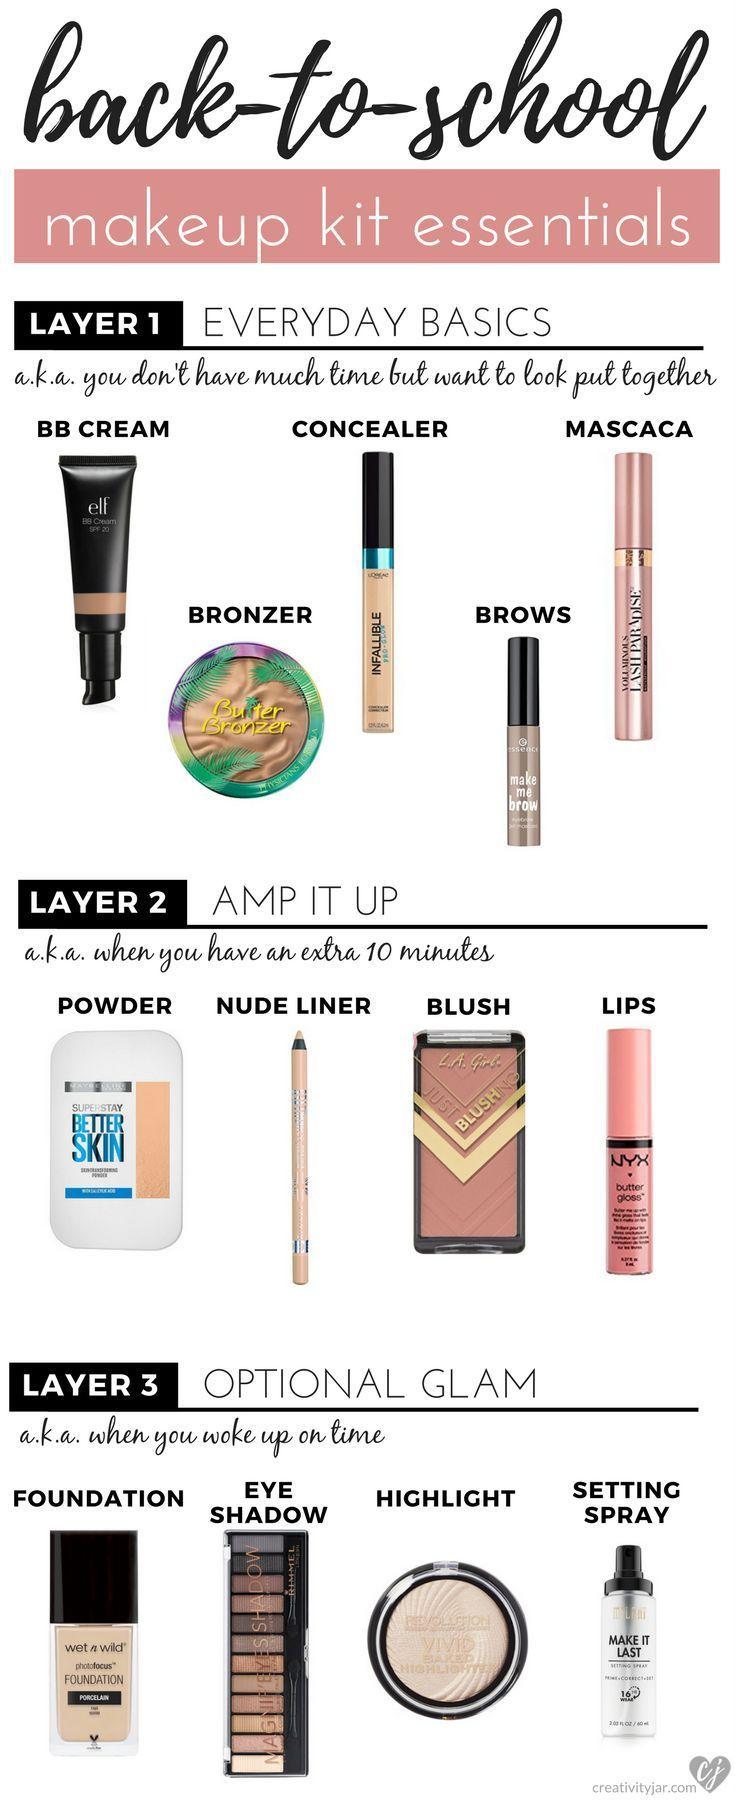 BackToSchool Makeup Kit Essentials Makeup kit